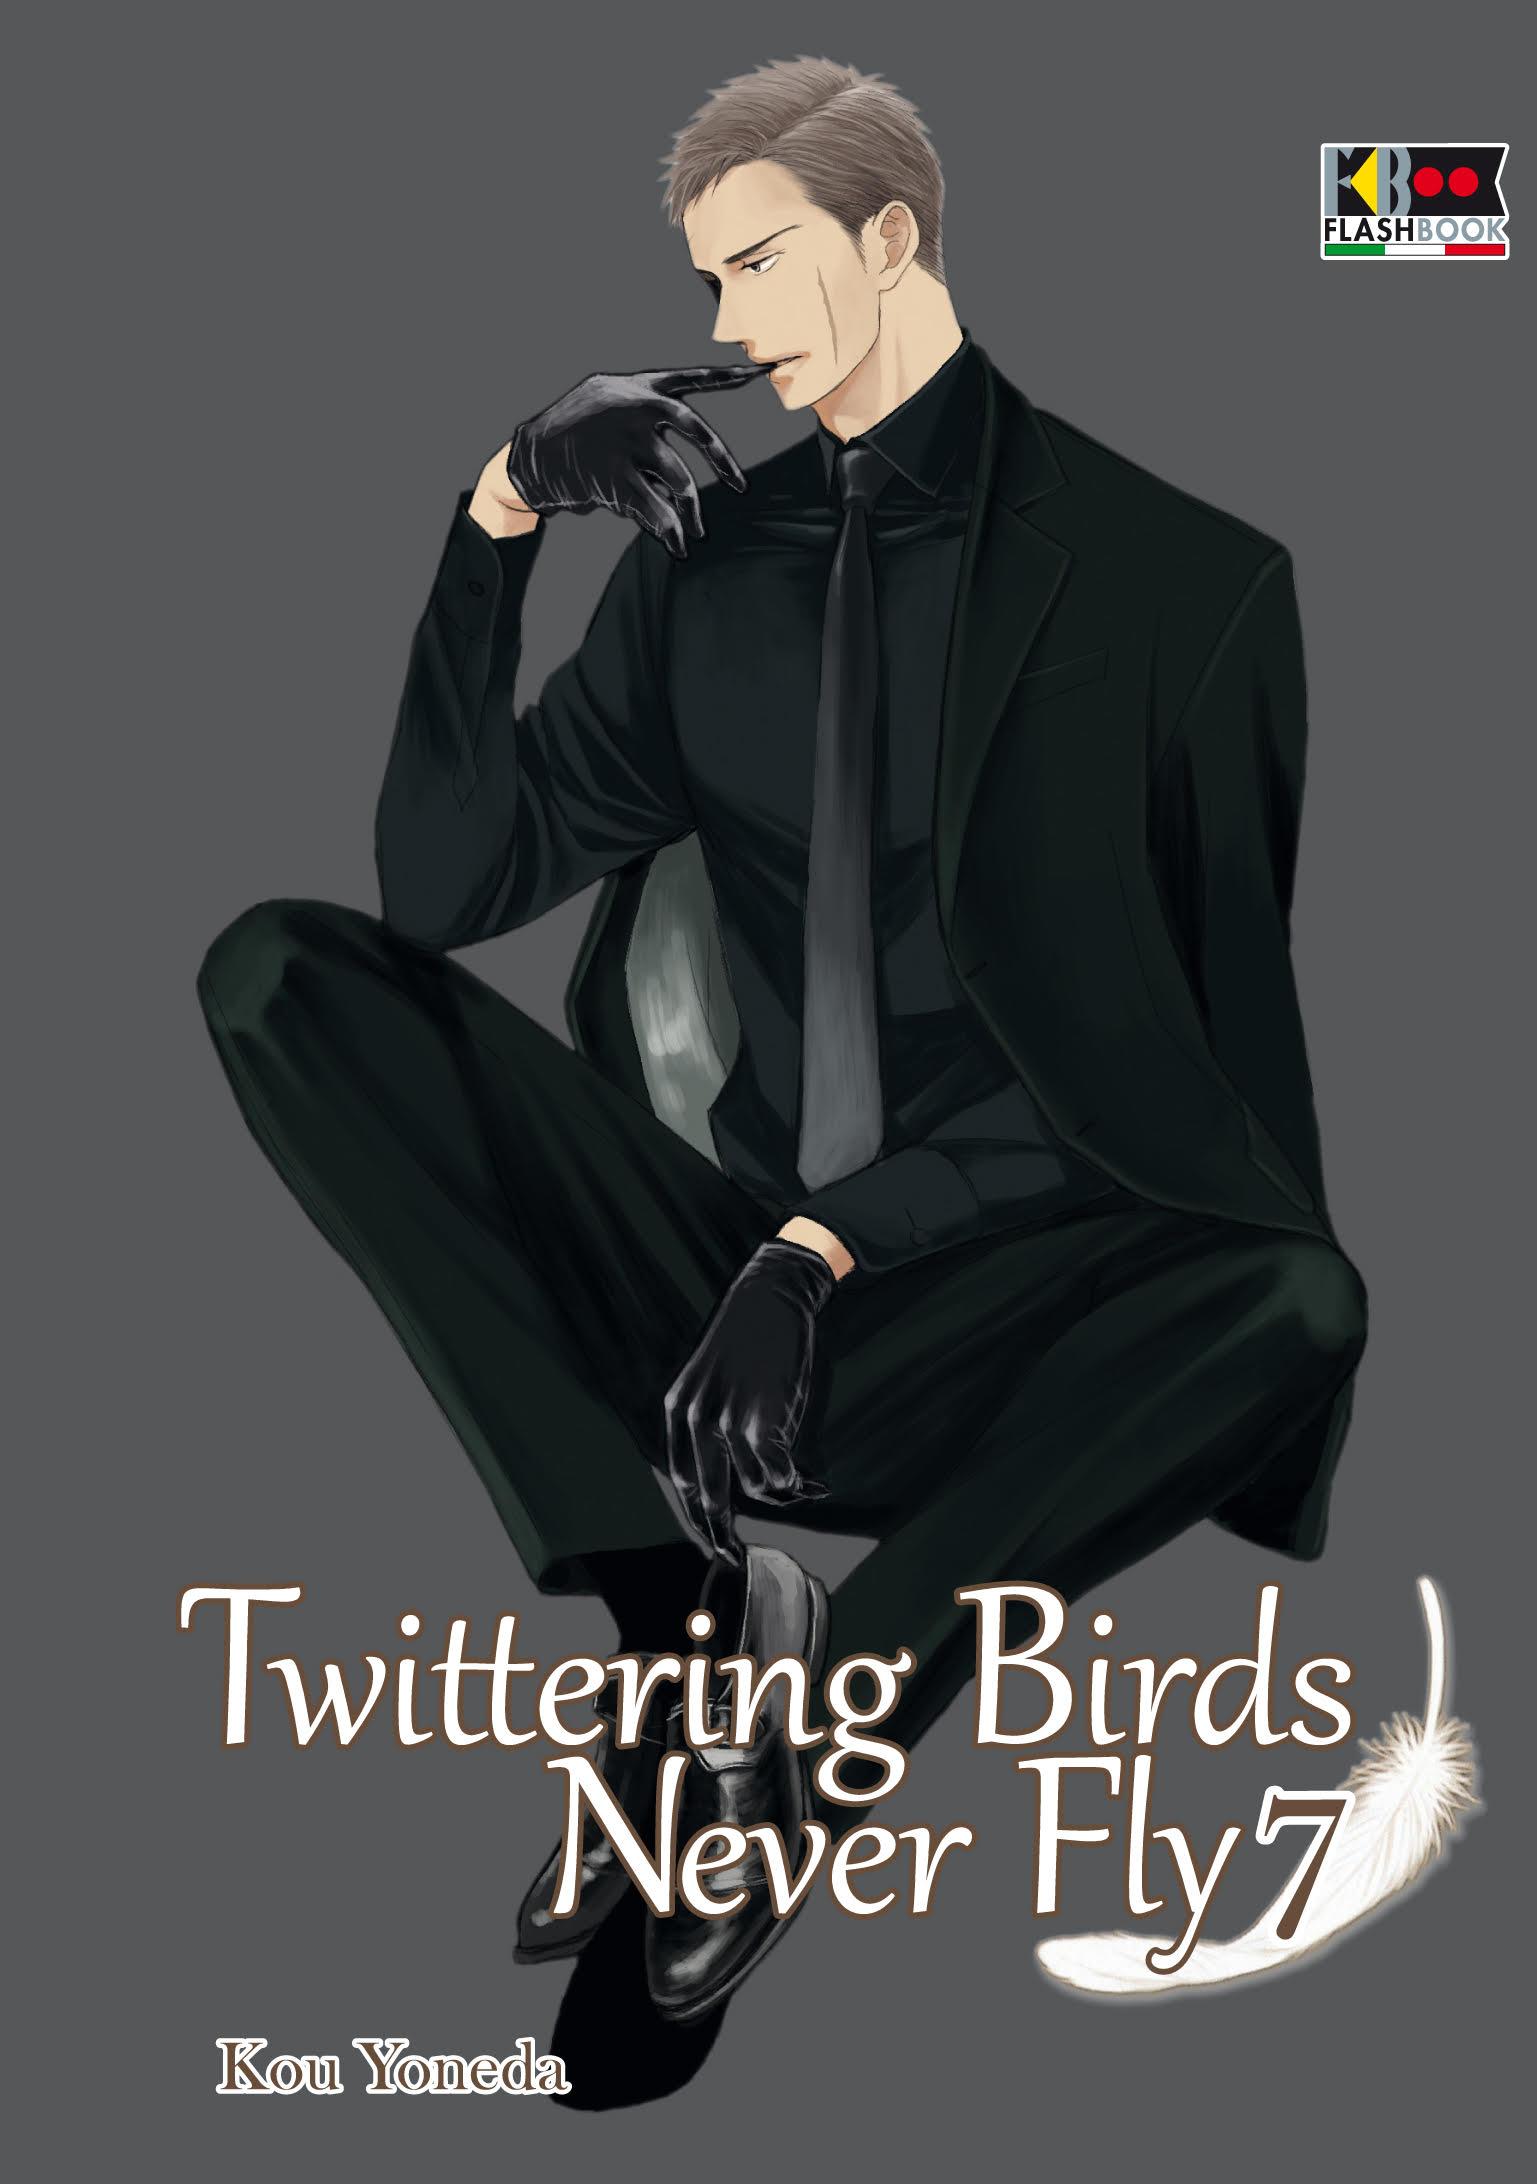 Twittering Birds Never Fly - 7 con omaggio speciale Mangasenpai